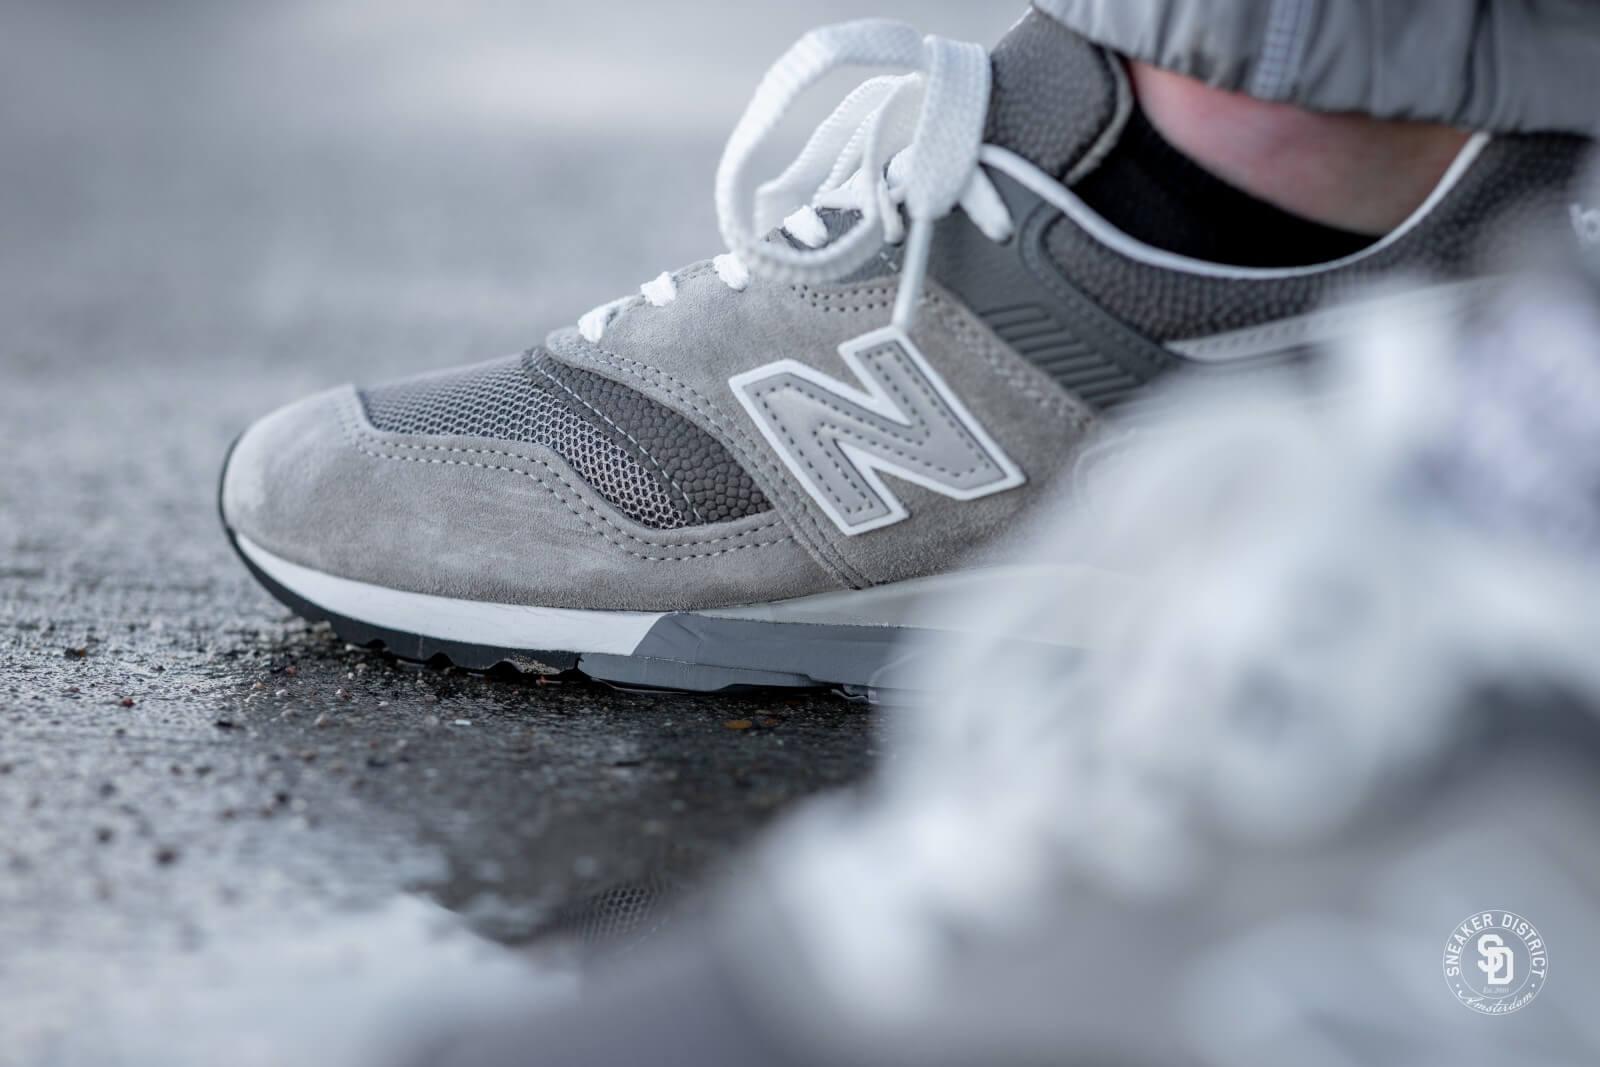 New Balance M997GY Grey Made In USA